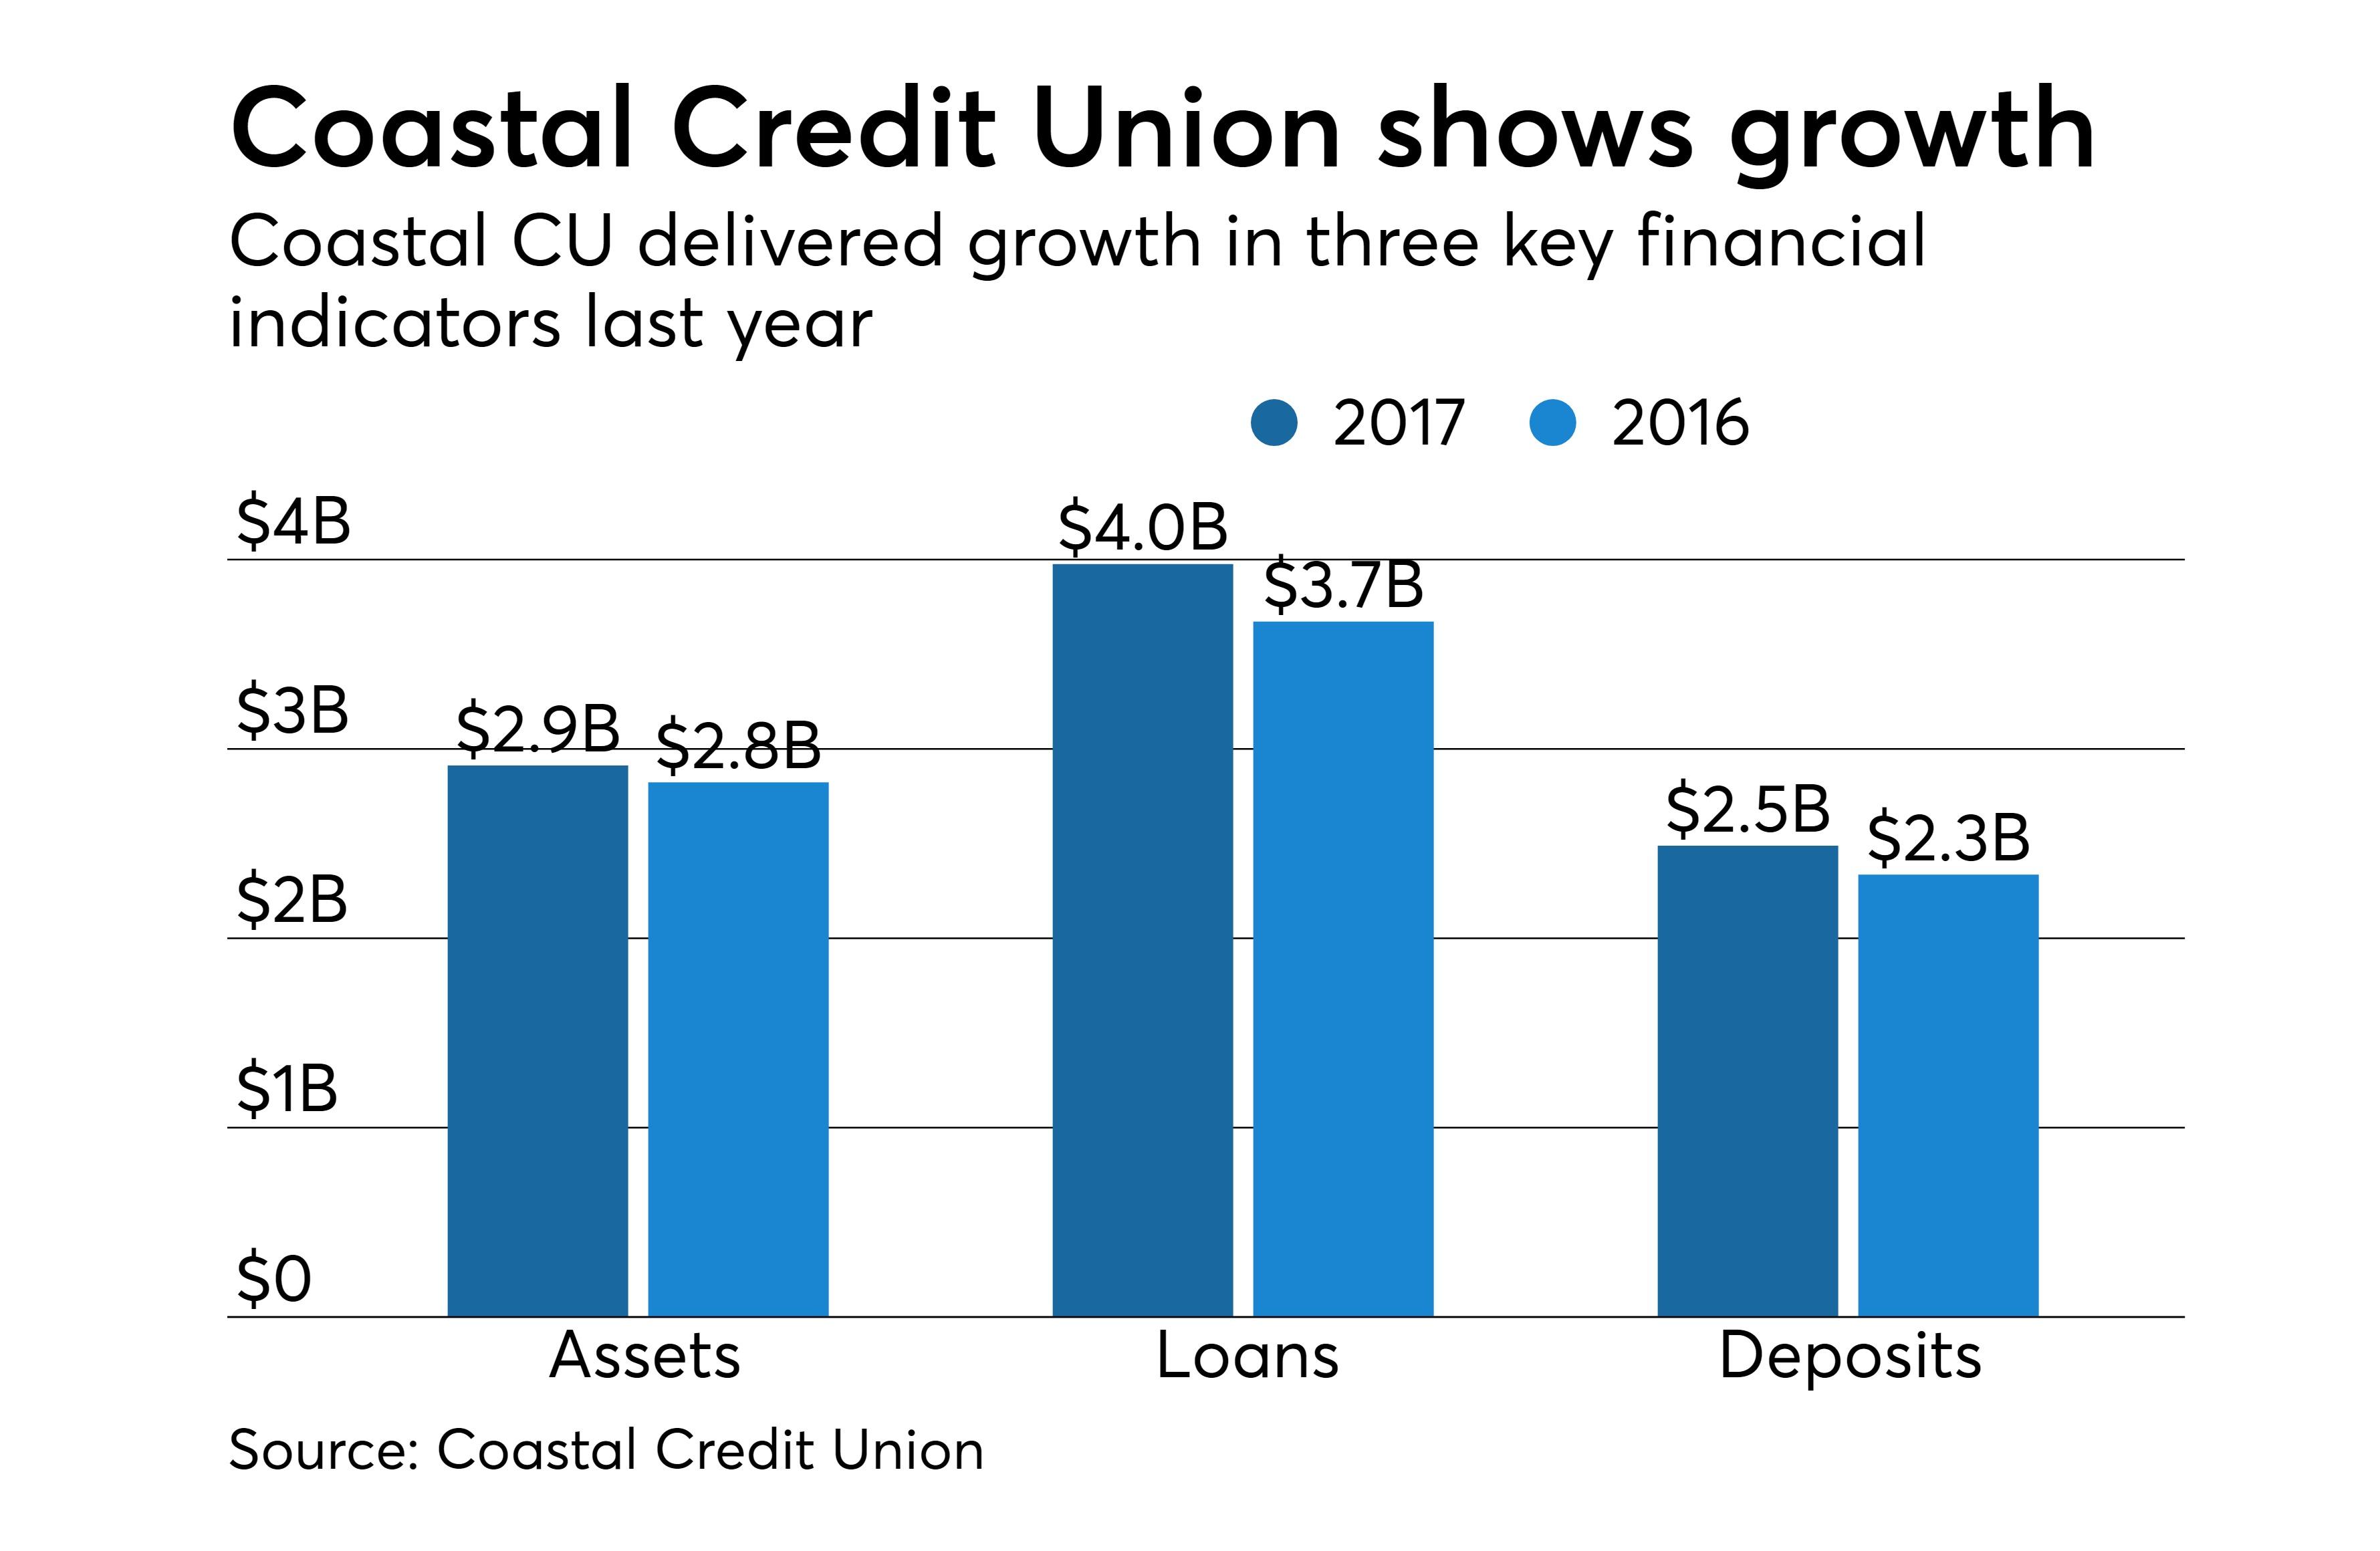 https://assets.sourcemedia.com/63/cc/bb40da924f6aa47138ad3754199c/coastal-cu-2017-results-cuj-042318.jpeg